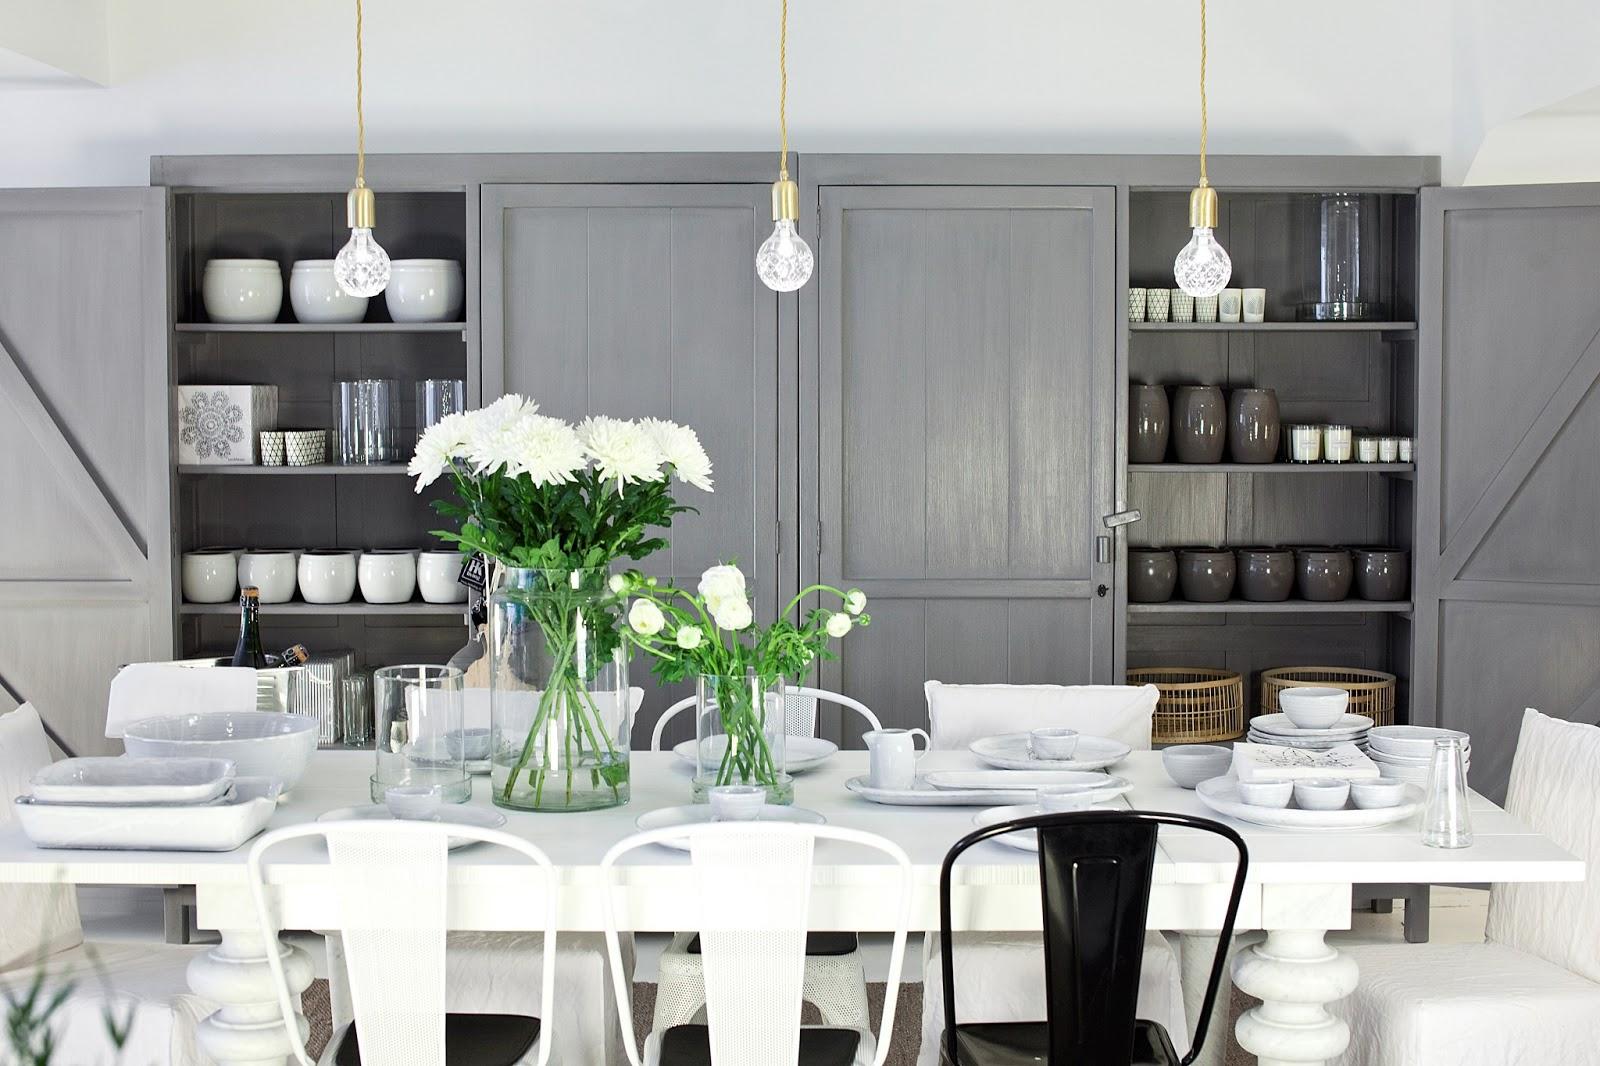 bohemia inspirasjon fra bohemia meets tine k home. Black Bedroom Furniture Sets. Home Design Ideas